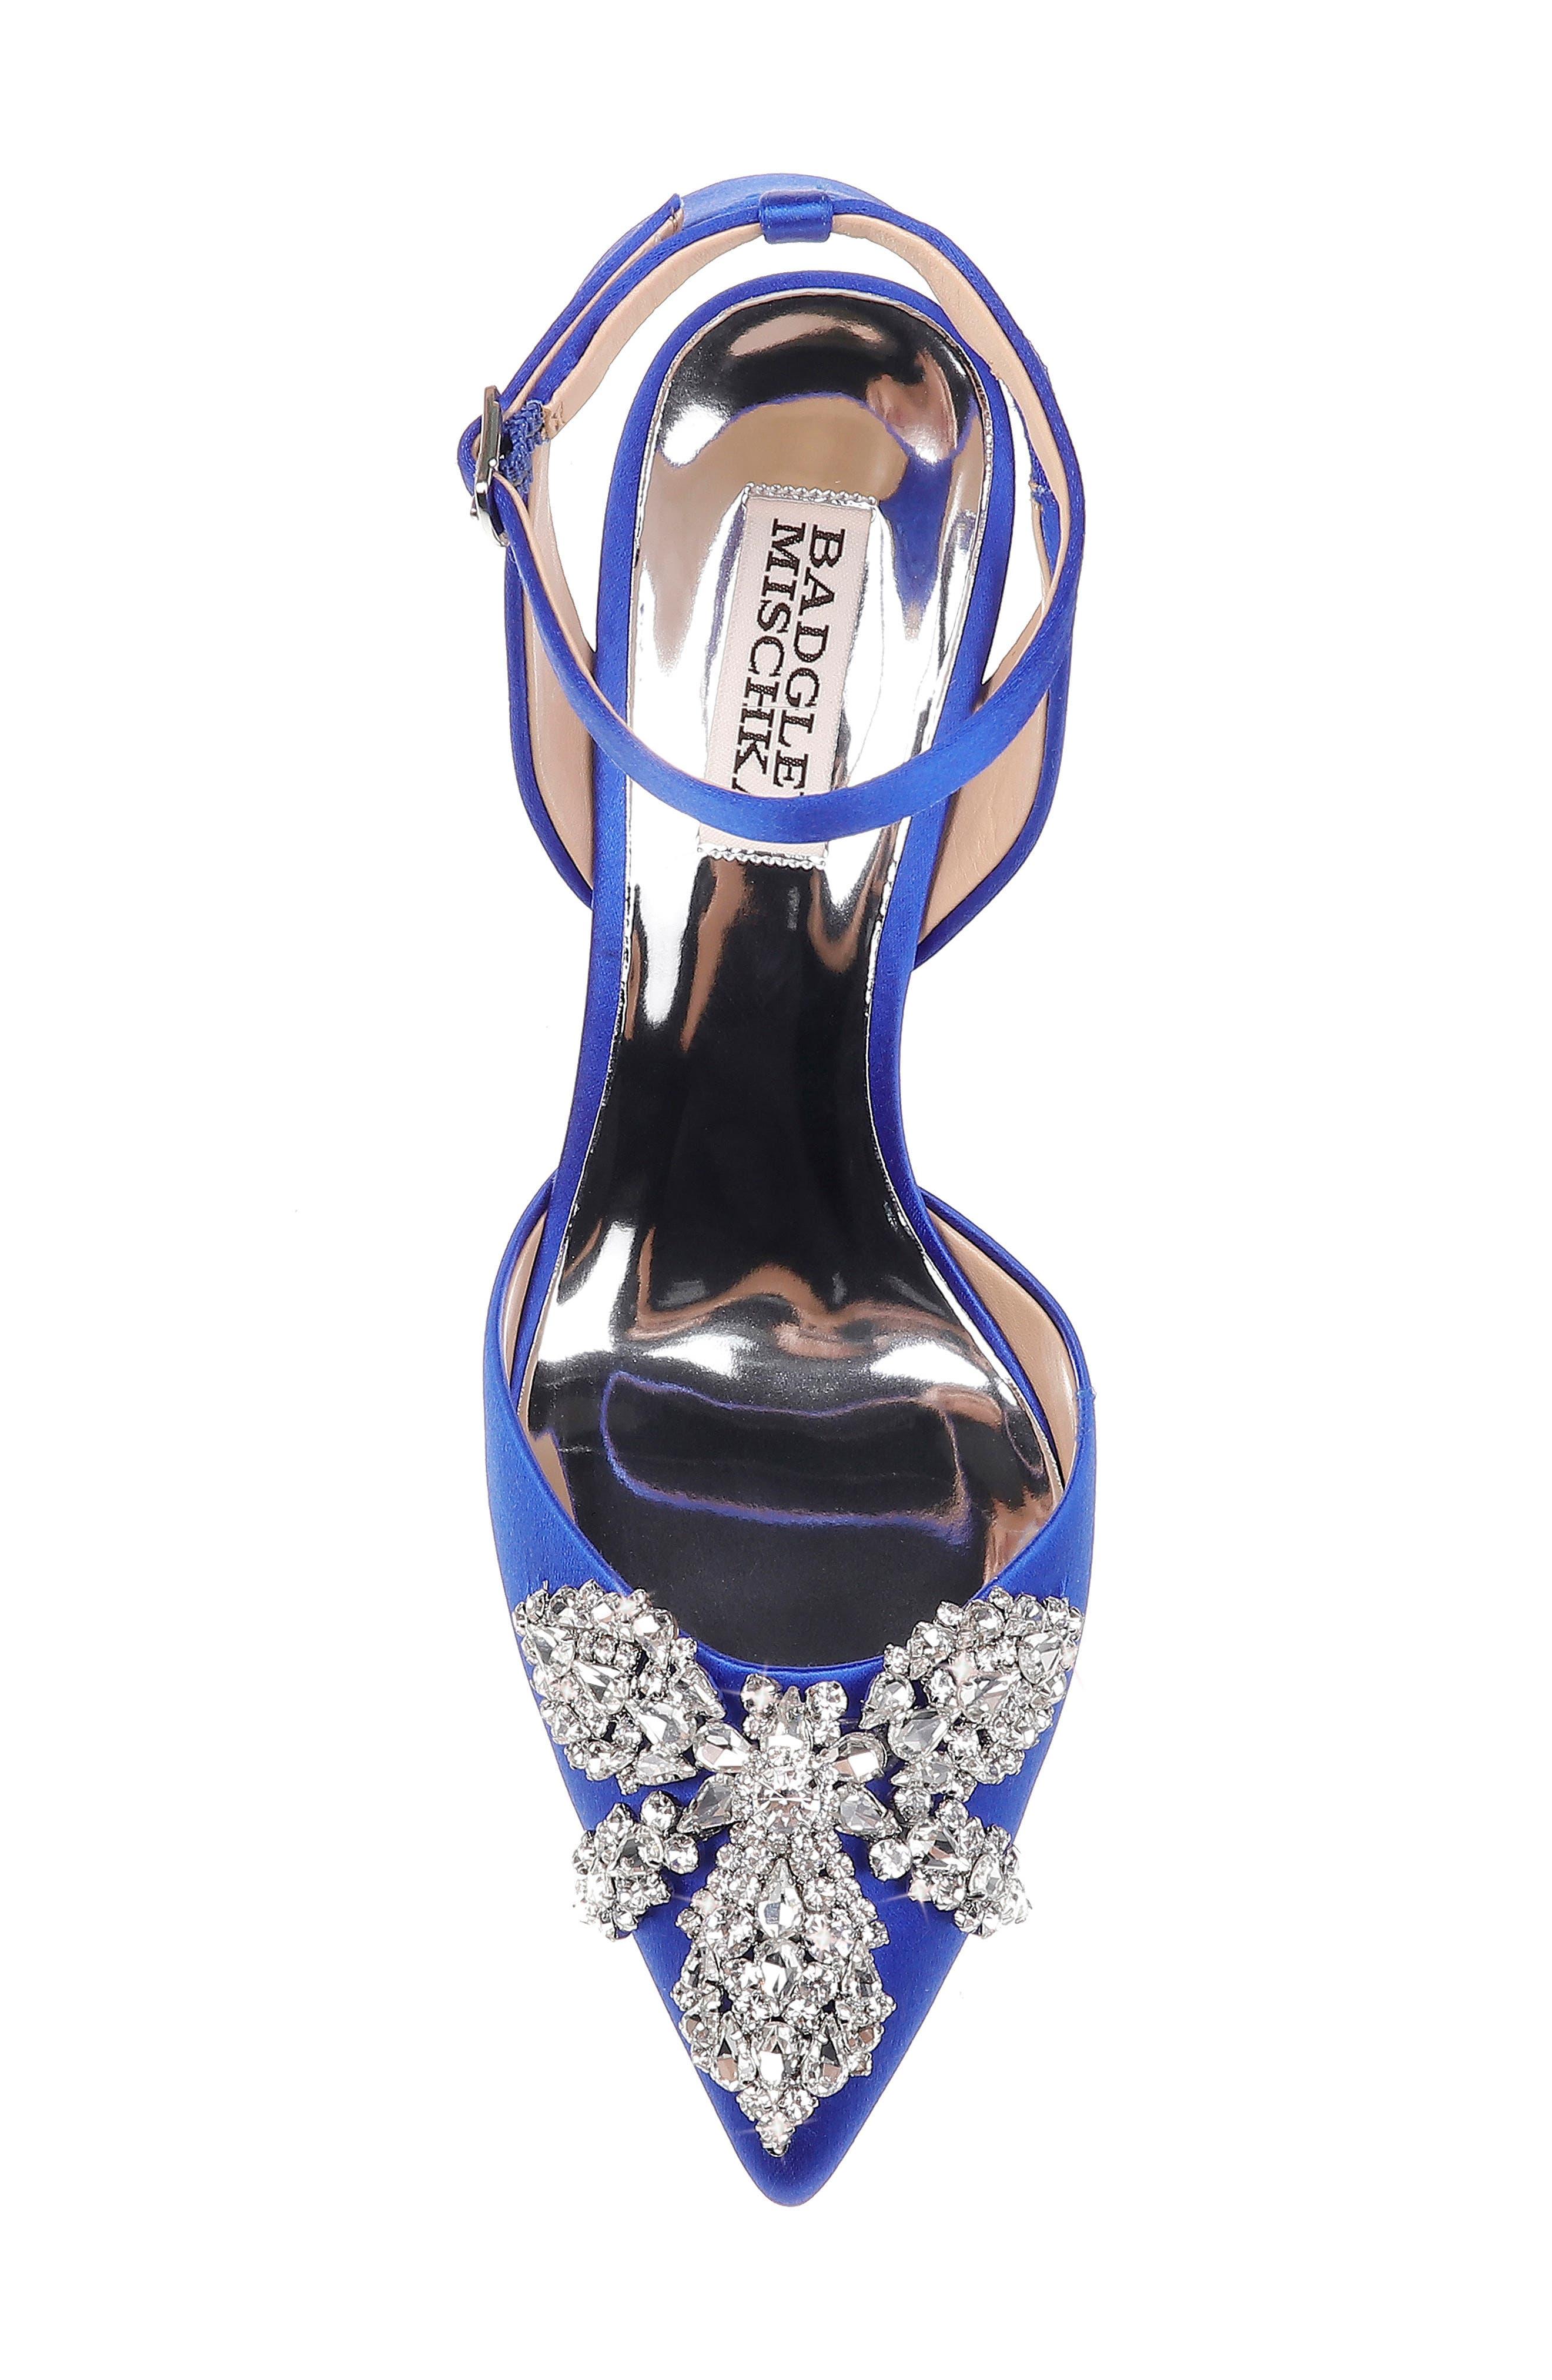 BADGLEY MISCHKA COLLECTION,                             Badgley Mischka Fana Crystal Embellished Pump,                             Alternate thumbnail 5, color,                             AFRICAN BLUE SATIN